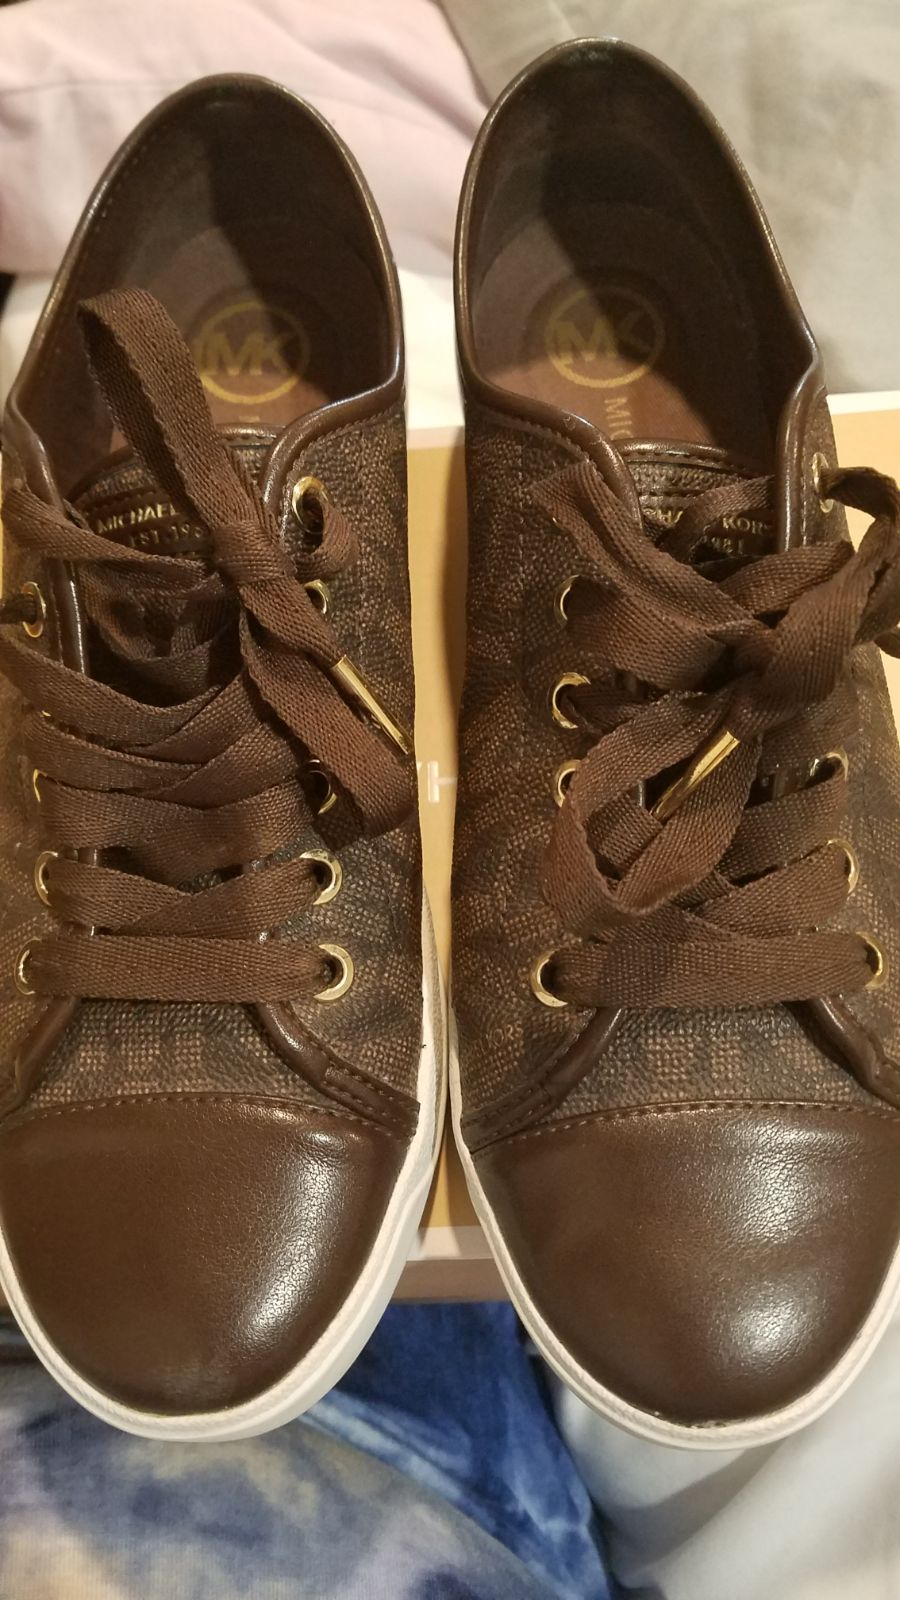 Michael Kors MK city sneakers size 8.5